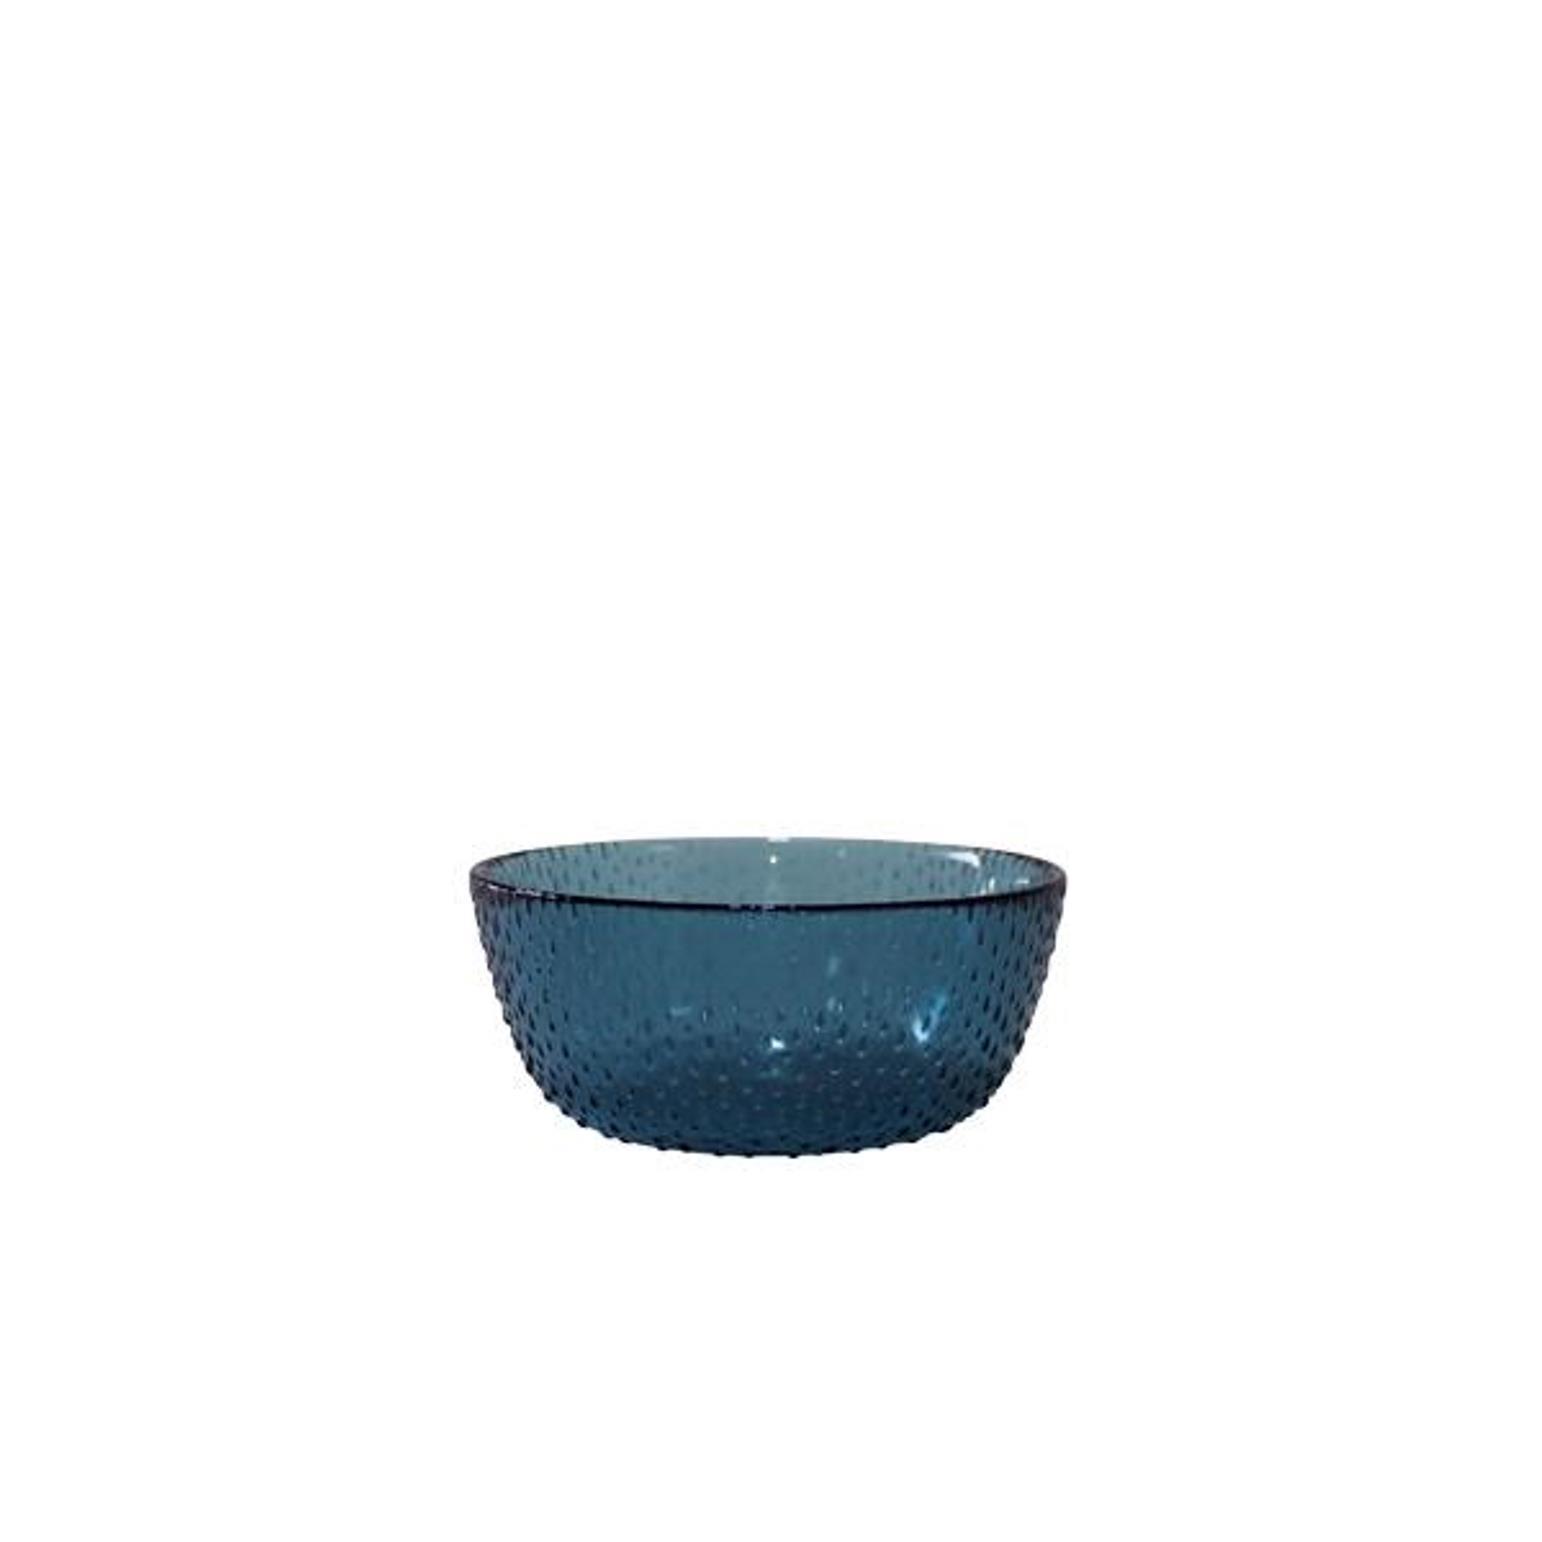 Онлайн каталог PROMENU: Пиала Aida RAW, диаметр 14 см, высота 6 см, прозрачный синий                               15072